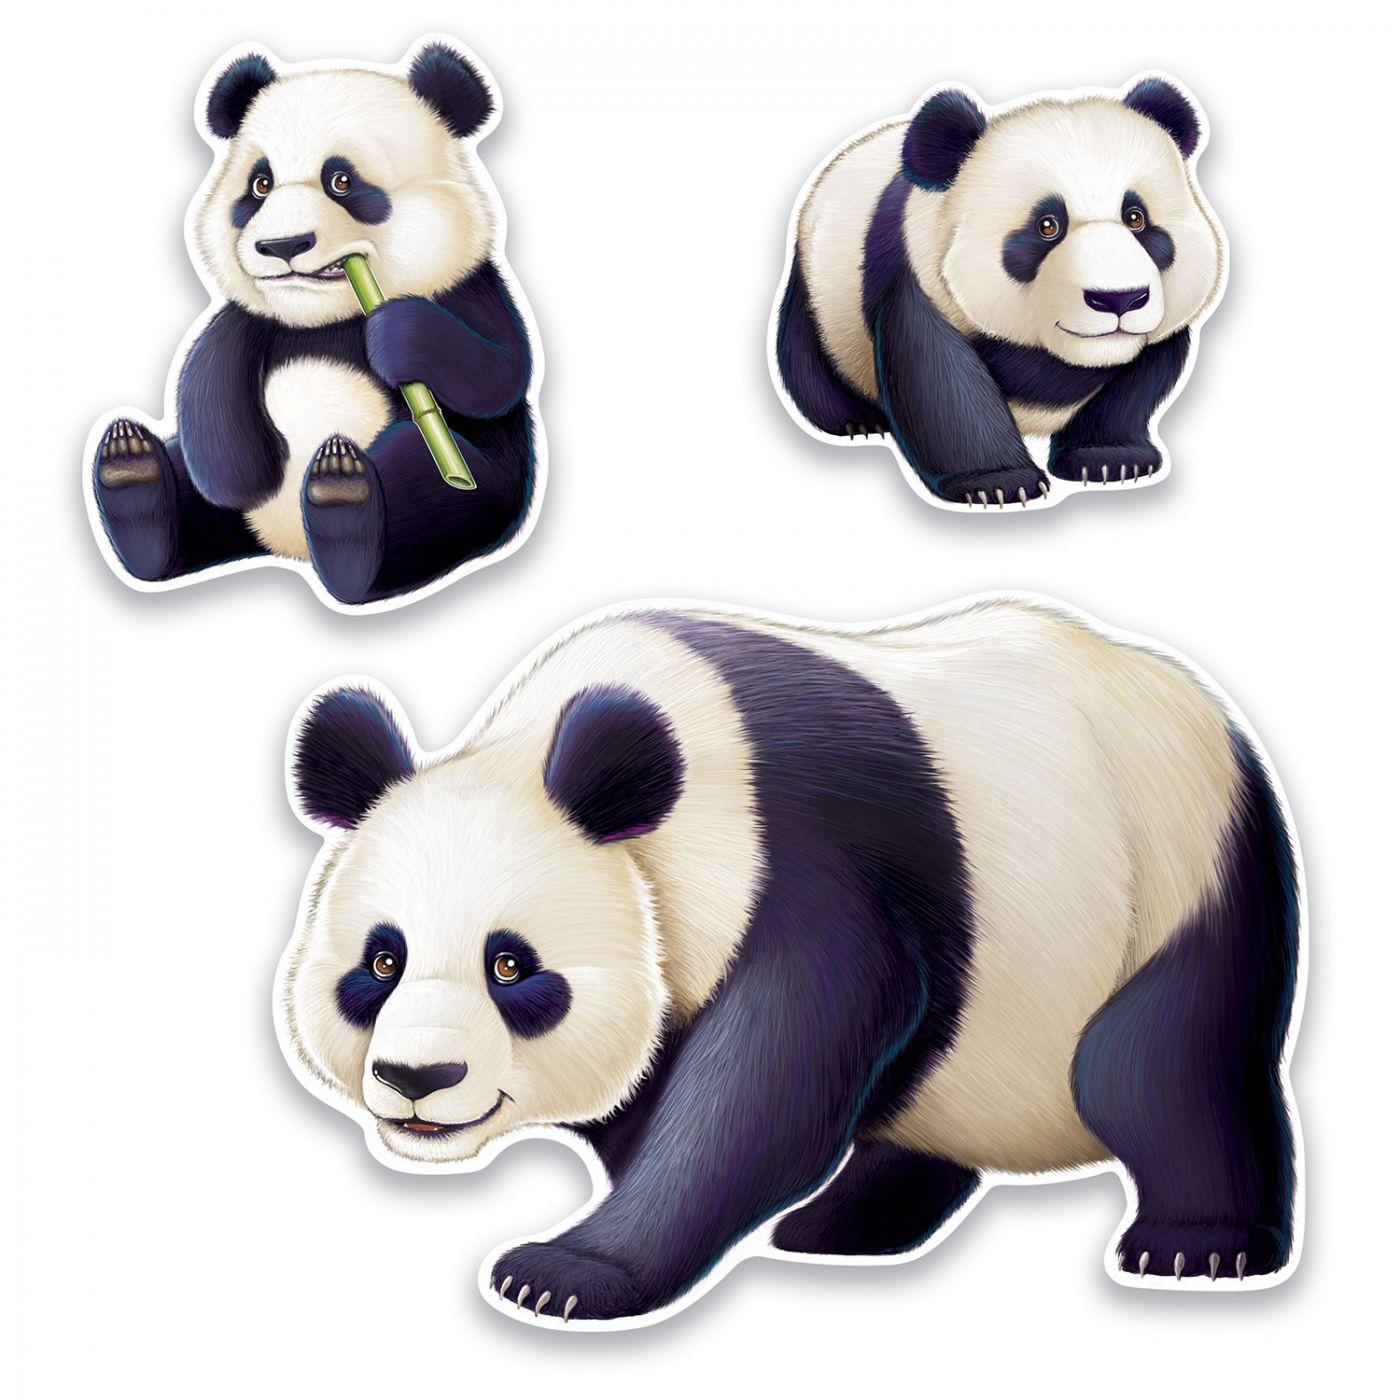 Panda Cutouts image